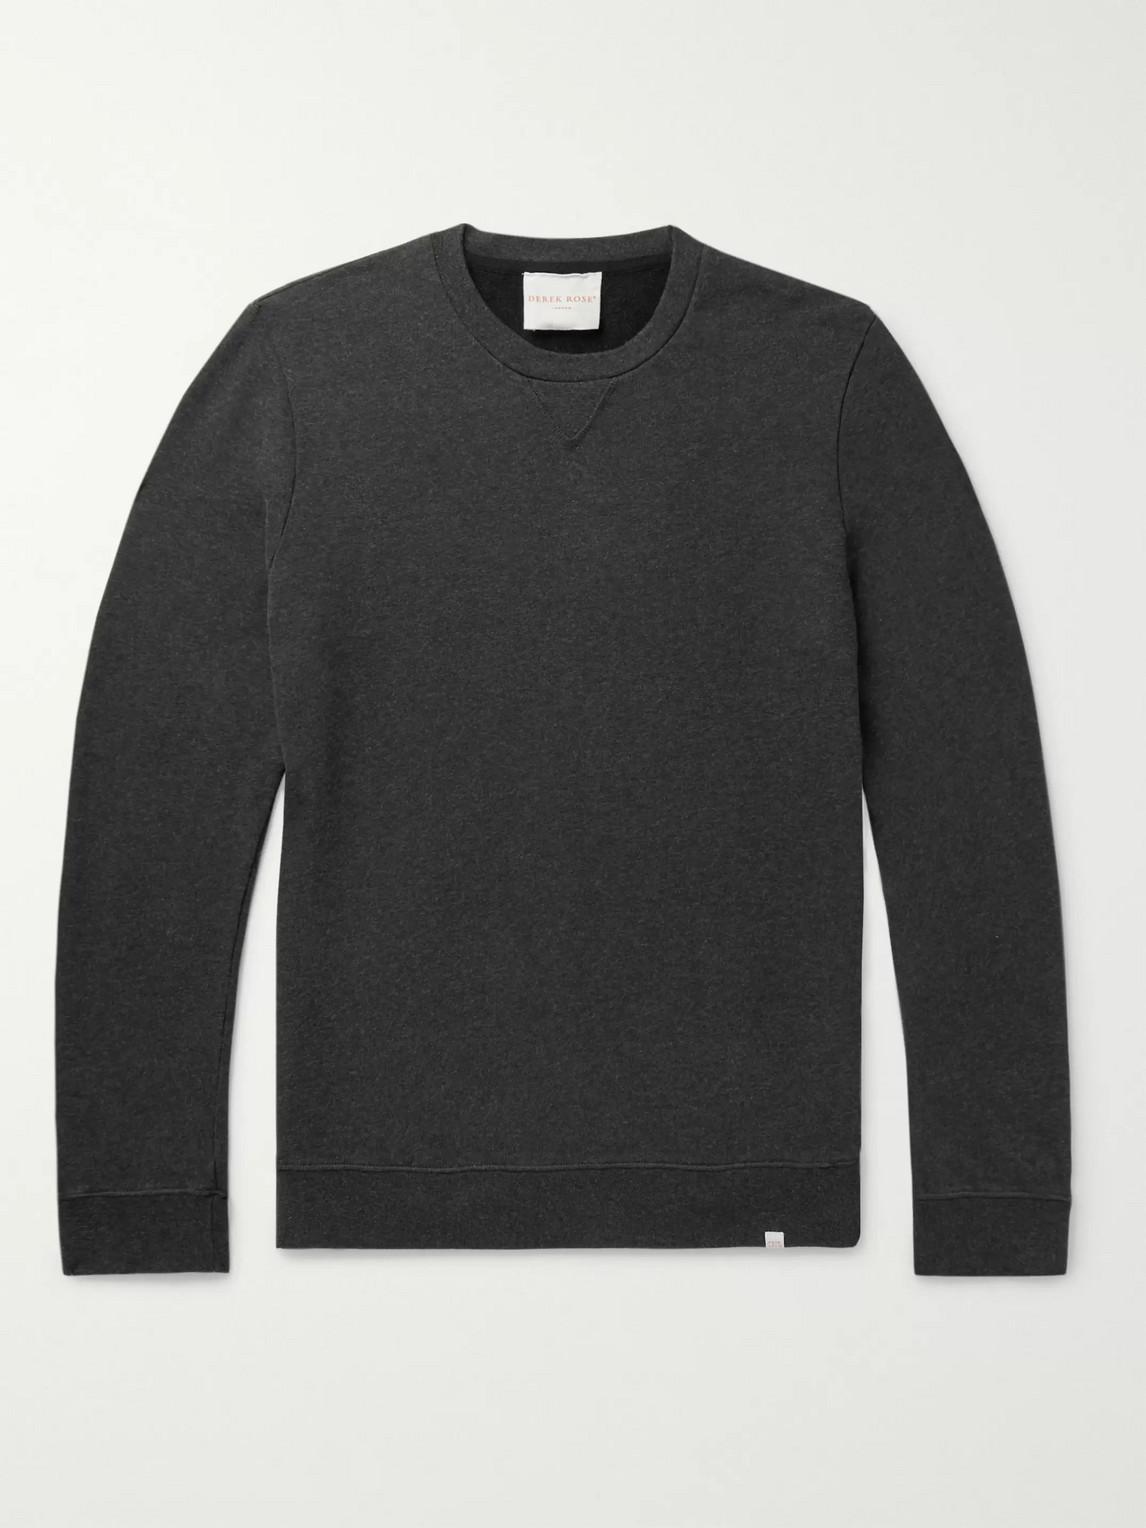 derek rose - devon brushed loopback cotton-jersey sweatshirt - gray